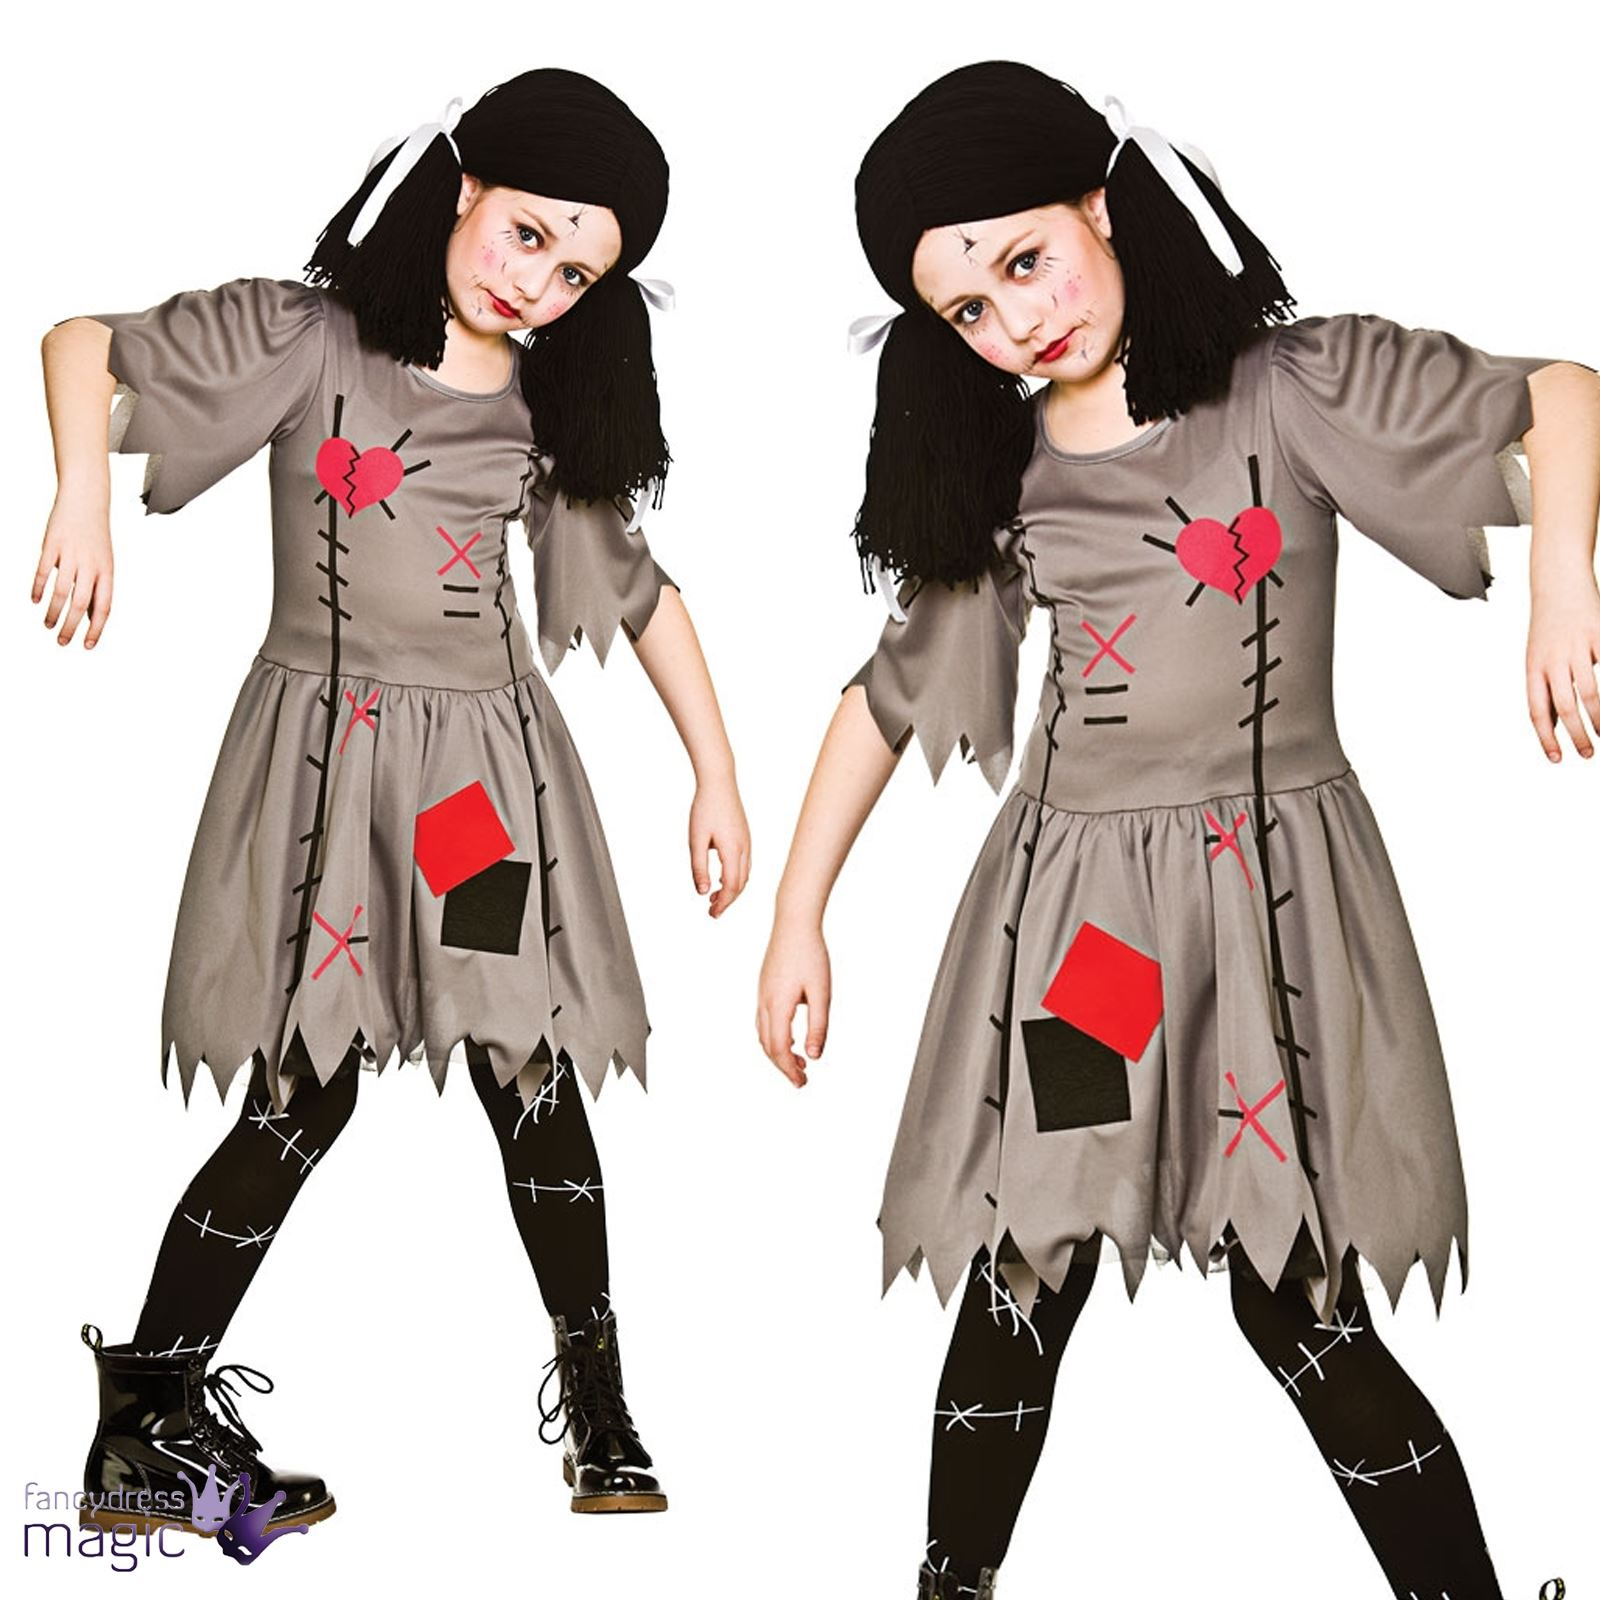 kinder m dchen bizarre voodoo evil puppe puppe halloween kost m kleid outfit ebay. Black Bedroom Furniture Sets. Home Design Ideas